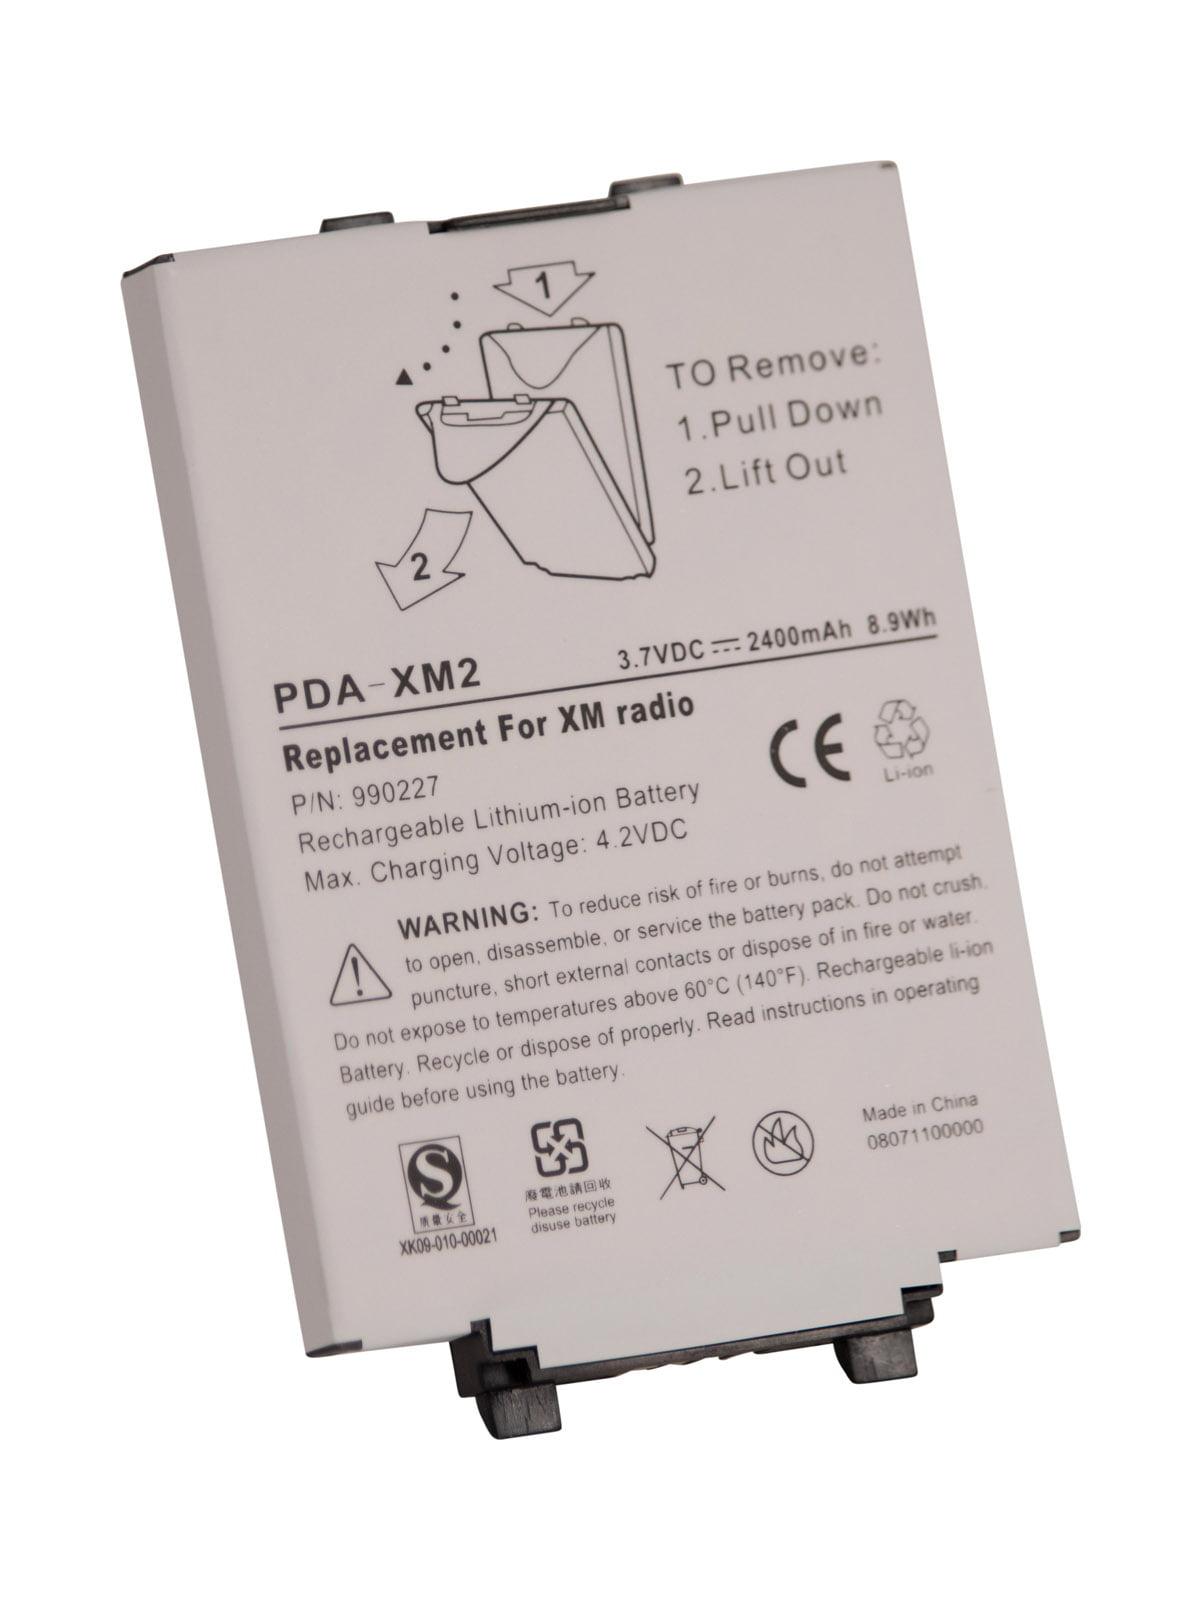 Ultralast Replacement Satellite Radio Battery 37 Volt Lithium Ion